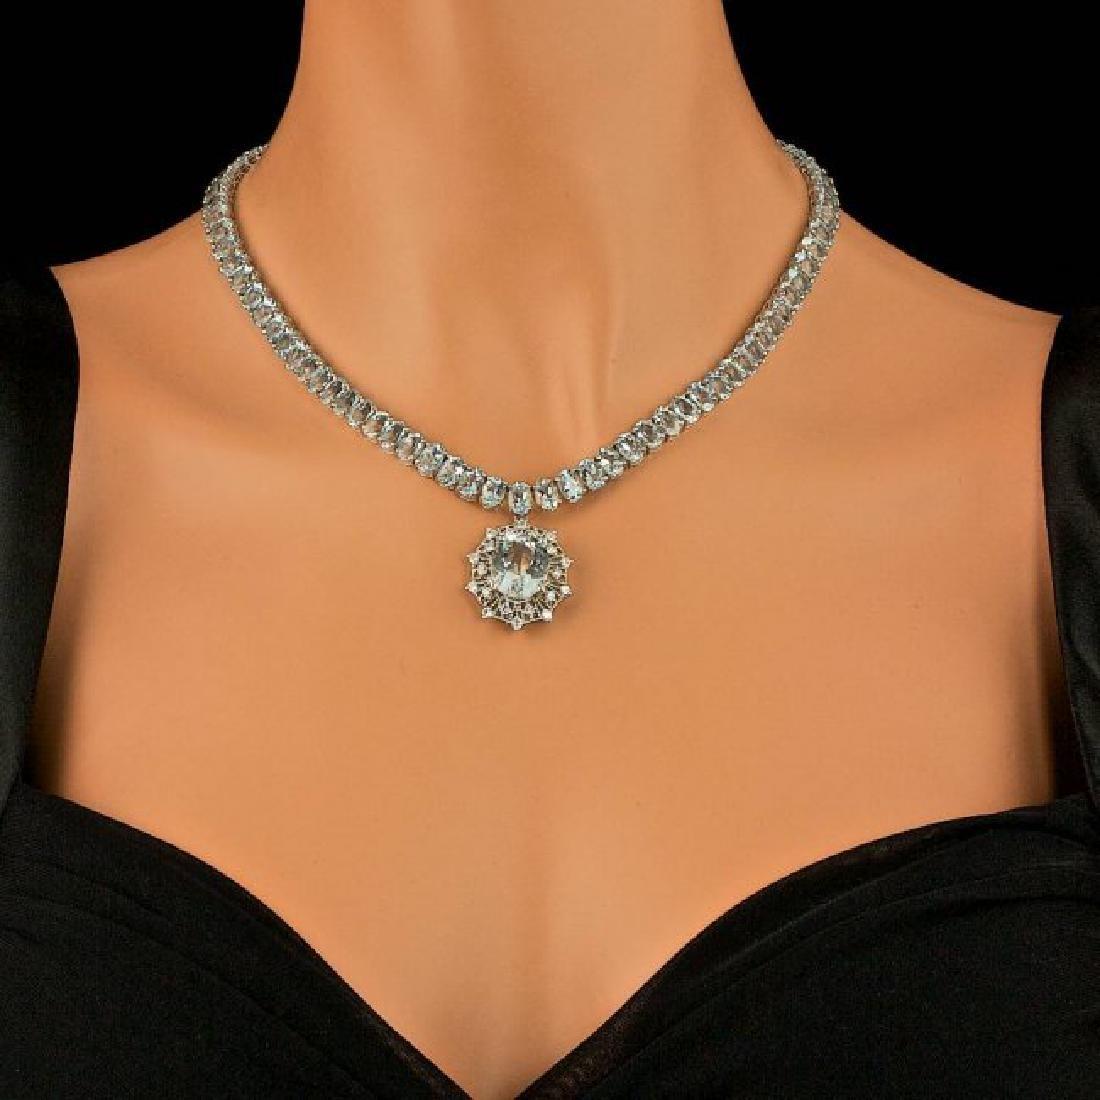 14k Gold 61ct Aquamarine 1.40ct Diamond Necklace - 4